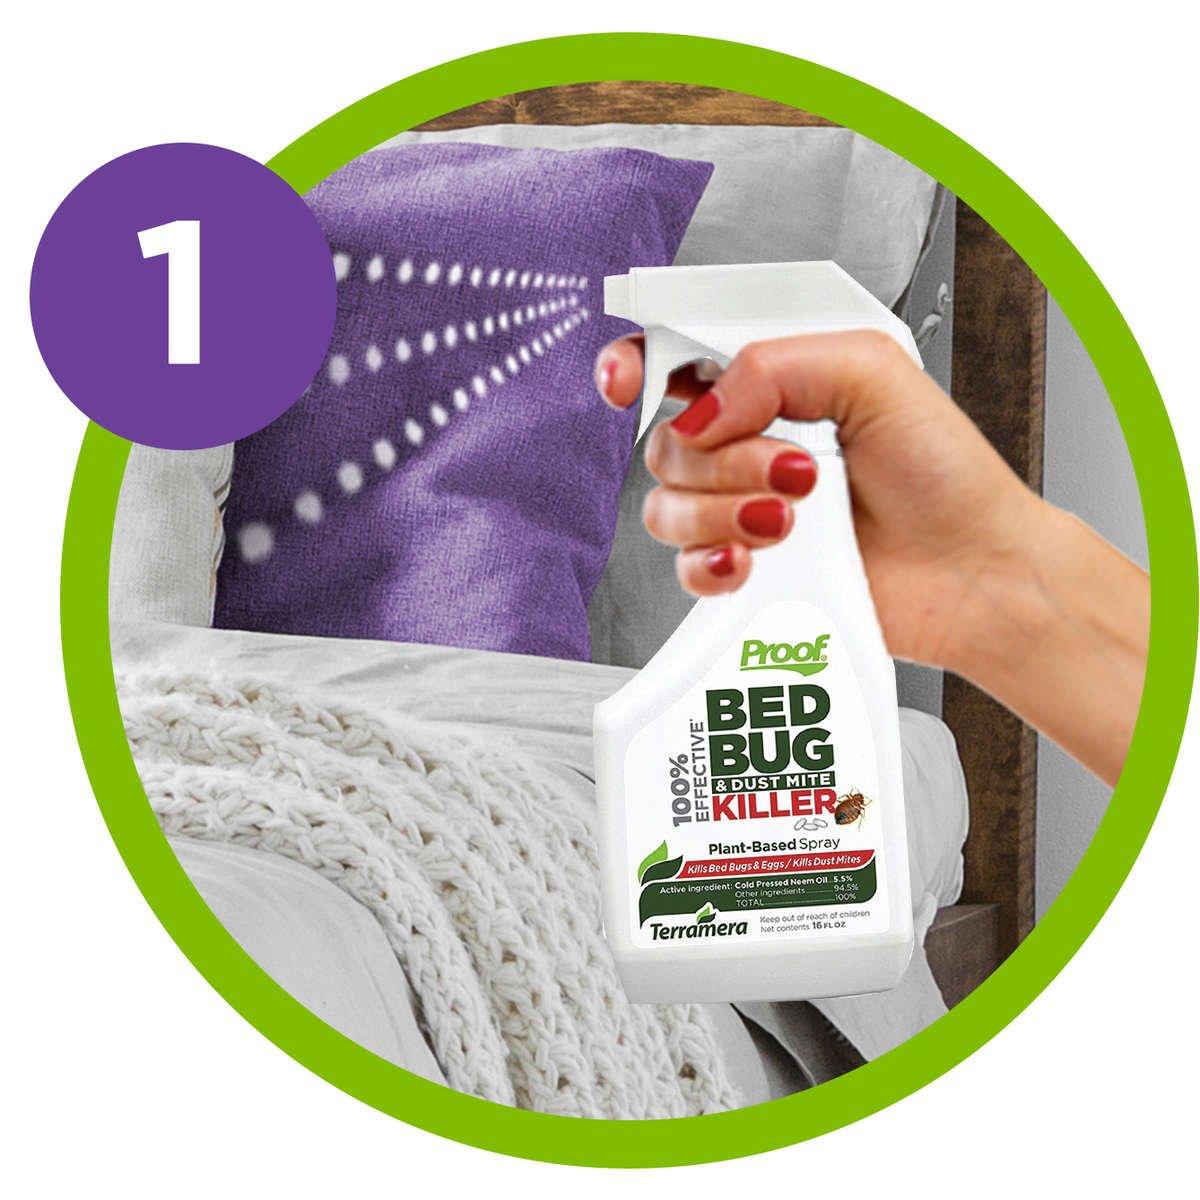 Proof Bed Bug Dust Mite Killer